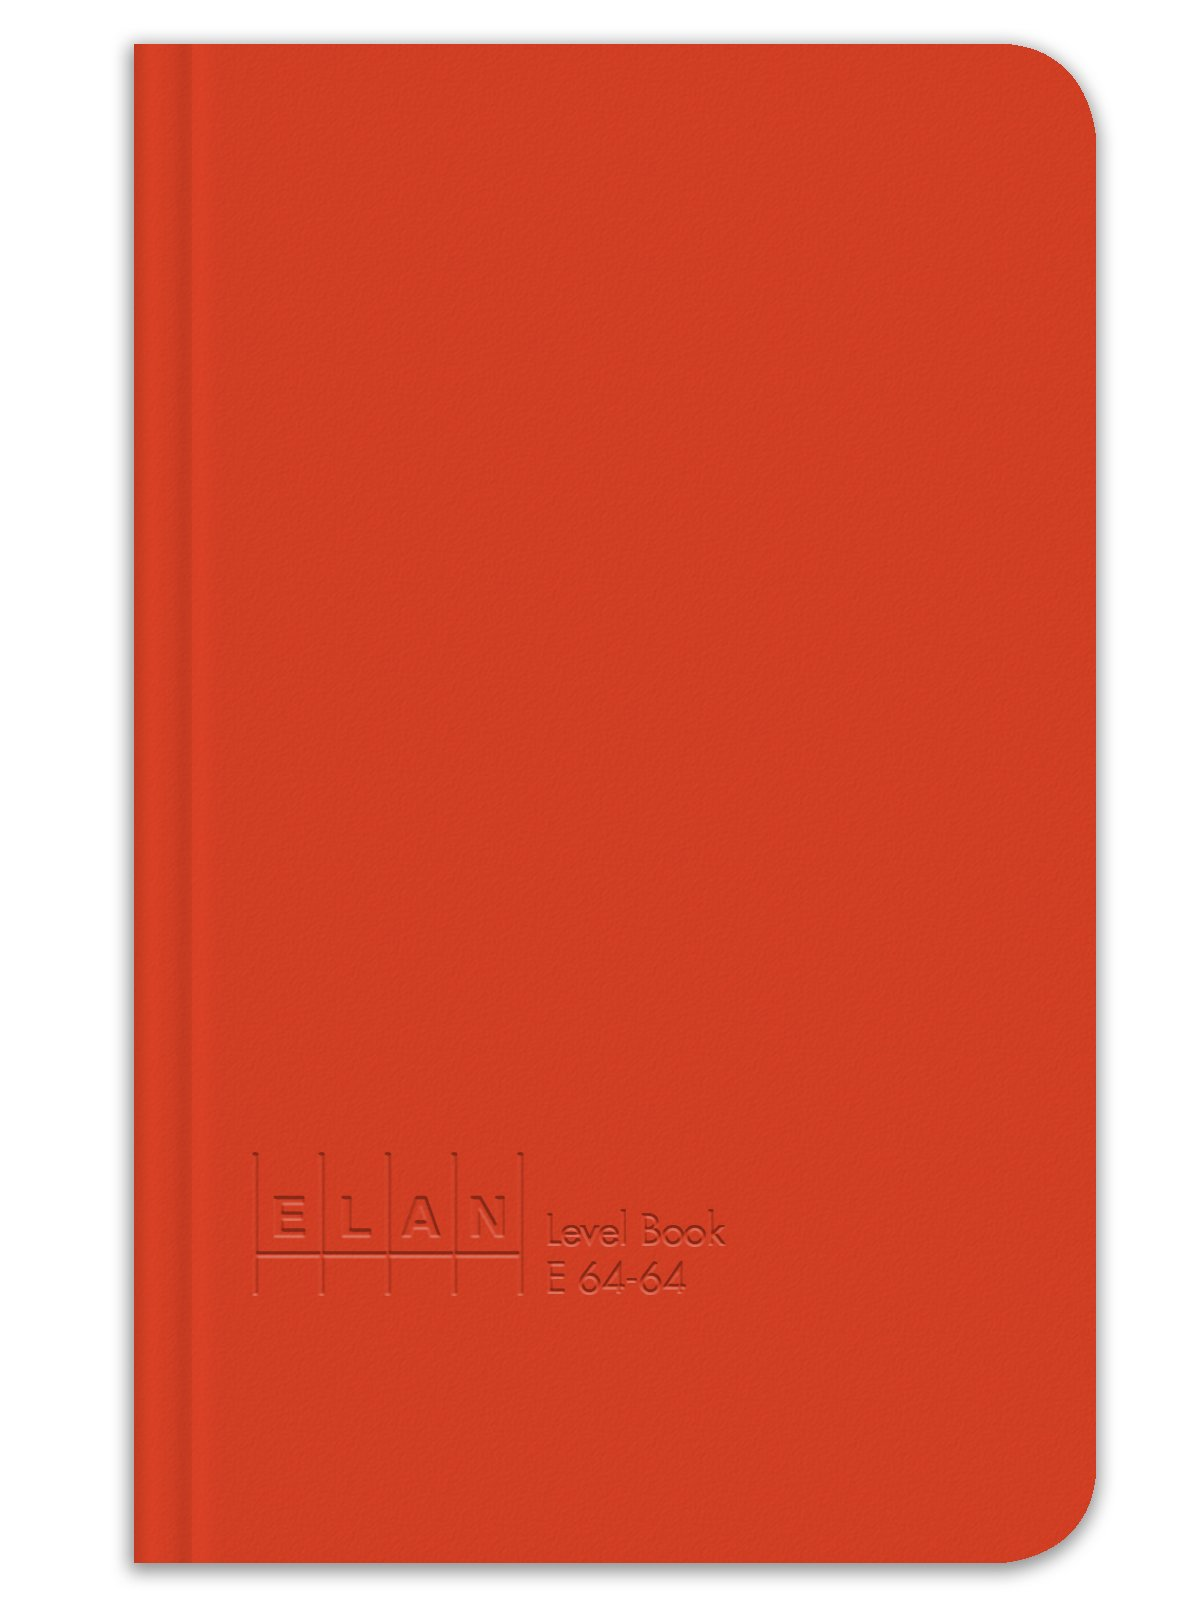 Elan Publishing Company E64-64 Level Book 4 ⅝ x 7 ¼, Bright Orange Cover (Pack of 6) by Elan Publishing Company